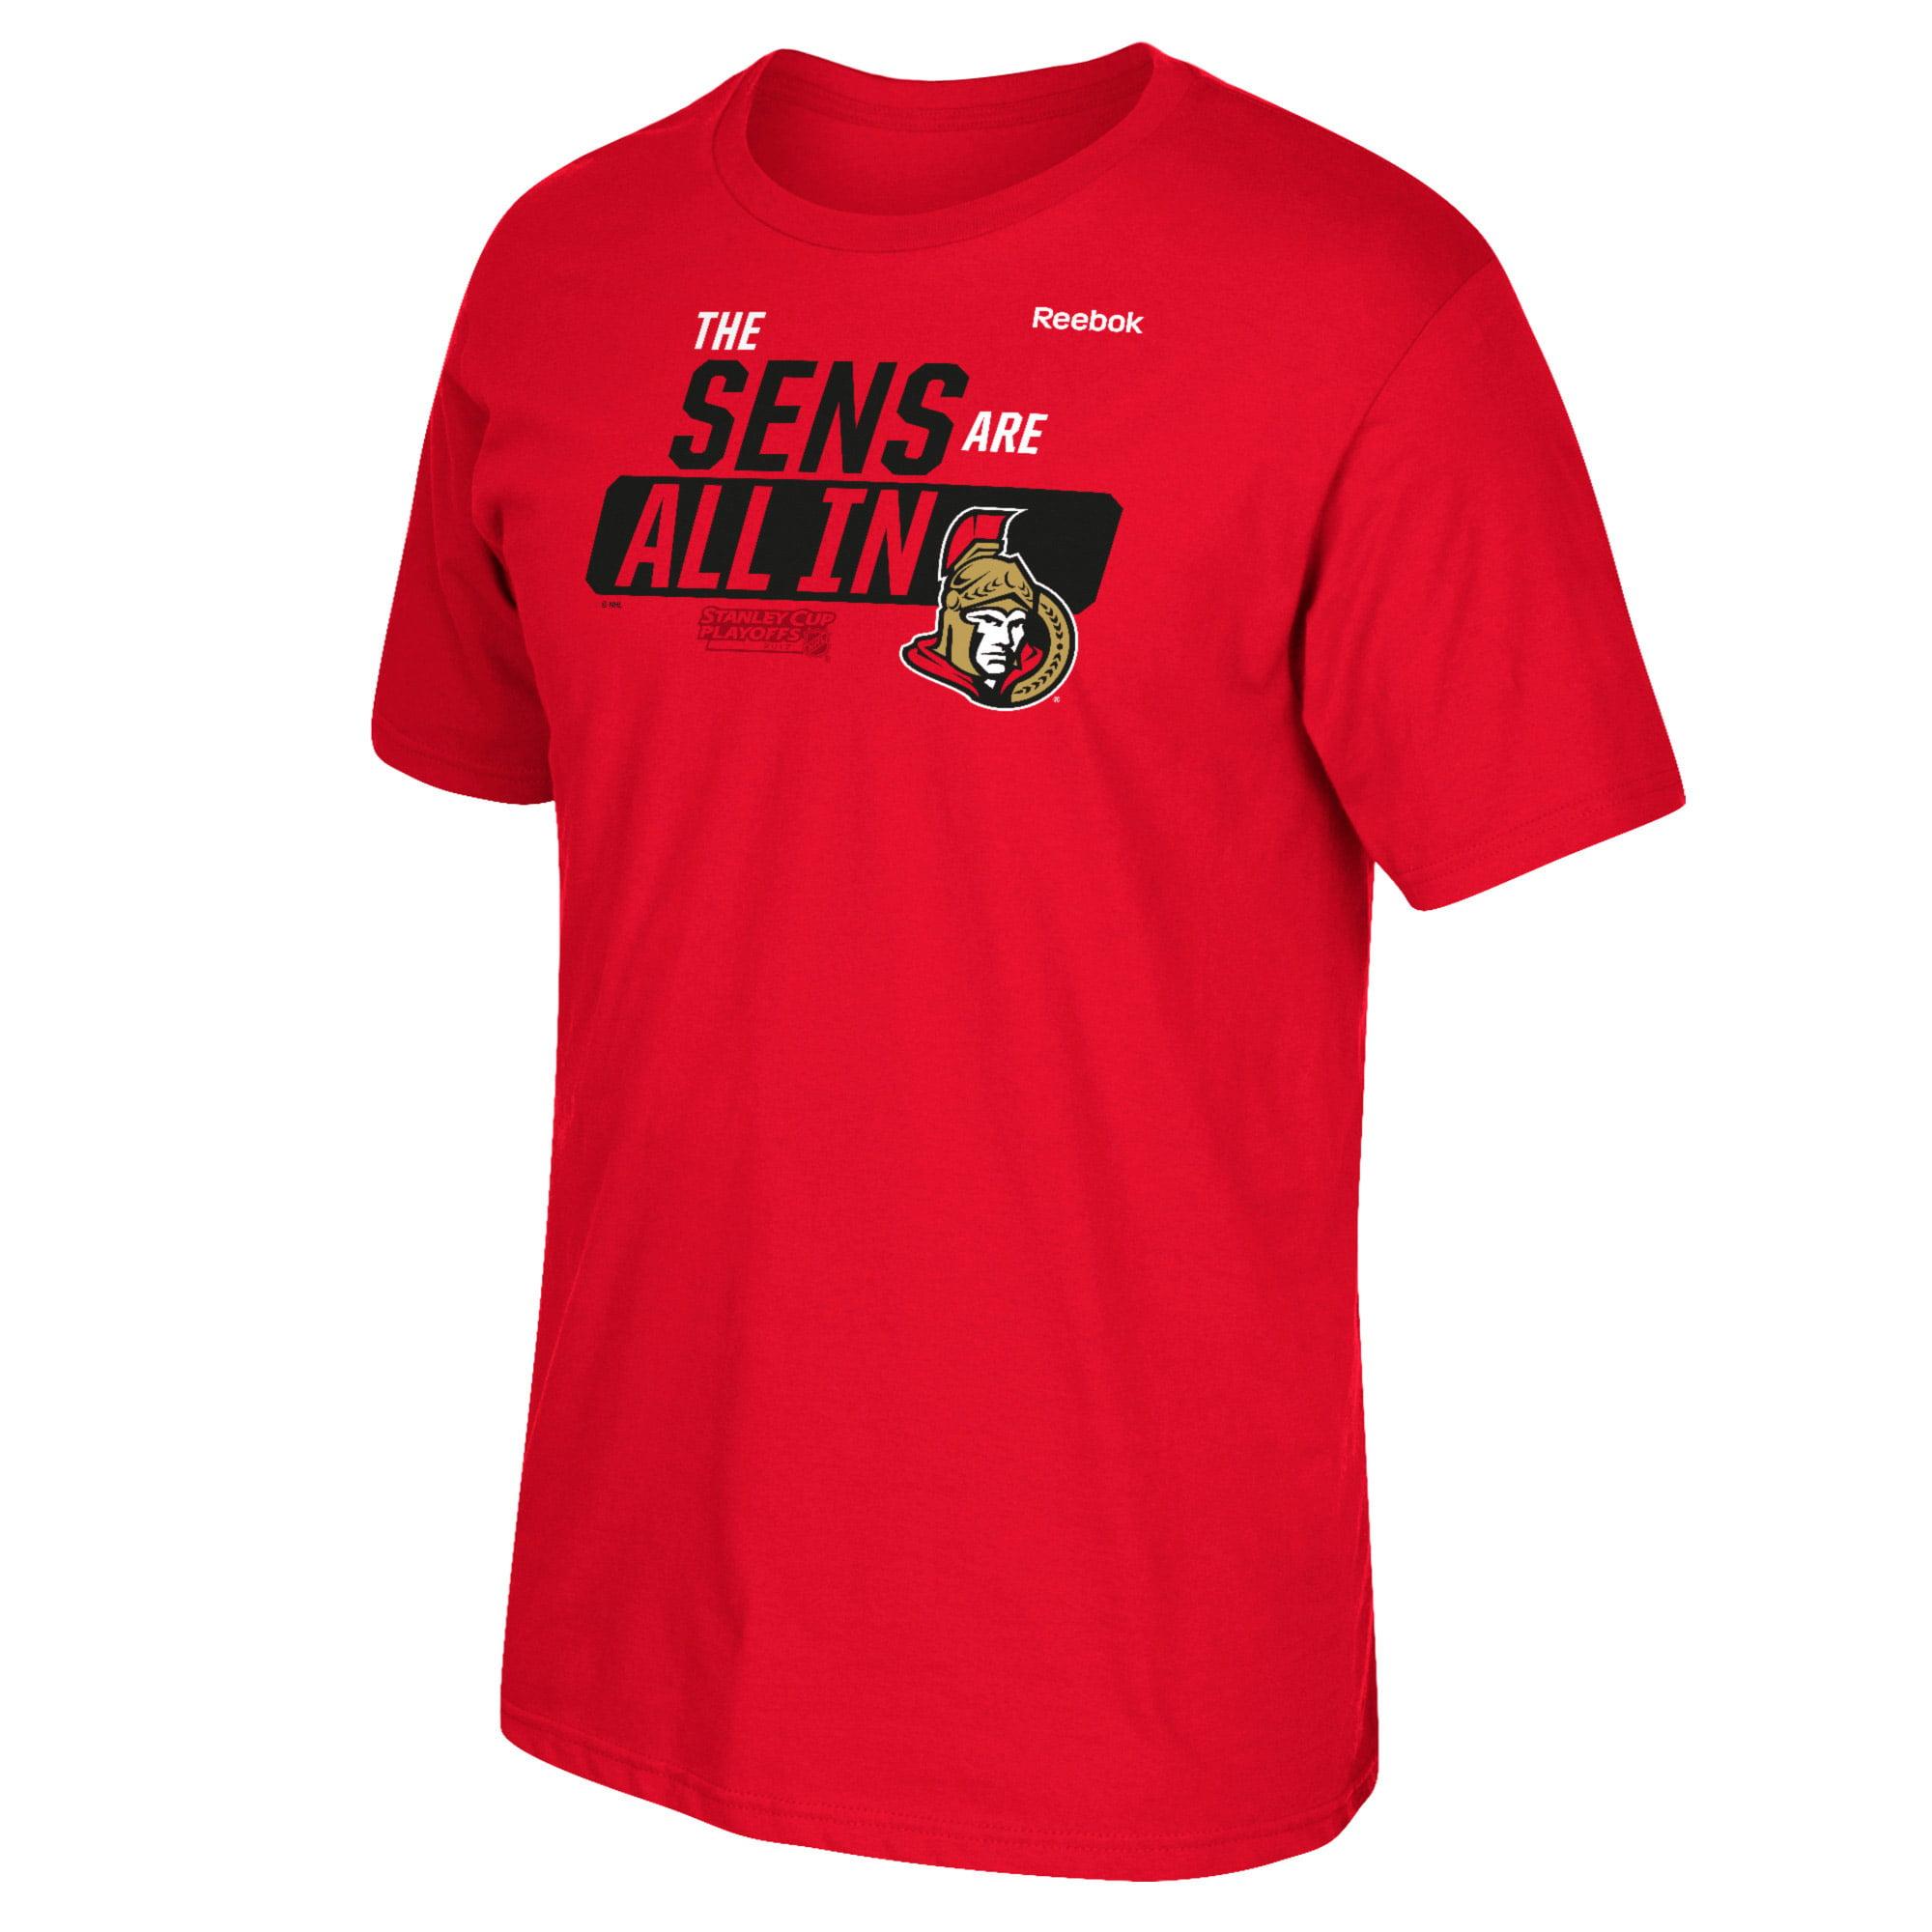 Ottawa Senators Reebok 2017 Stanley Cup Playoffs Slogan T-Shirt - Red